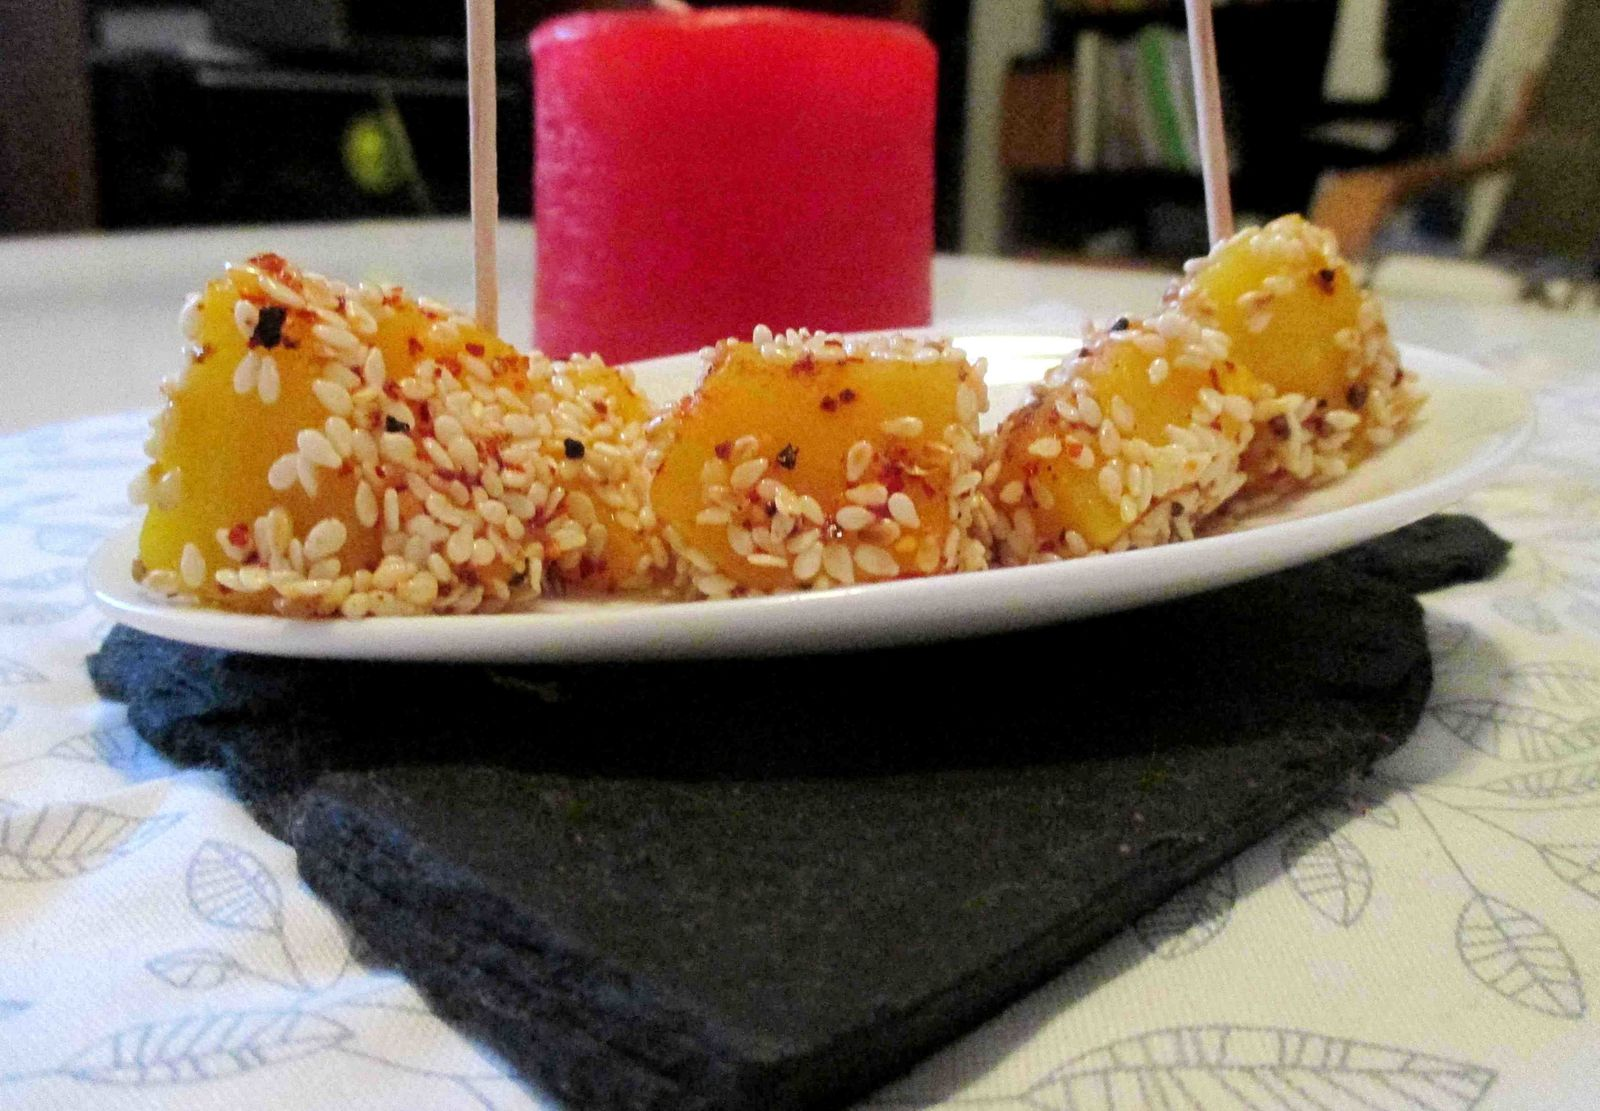 Battle Food N°13 - Les panés croustillants